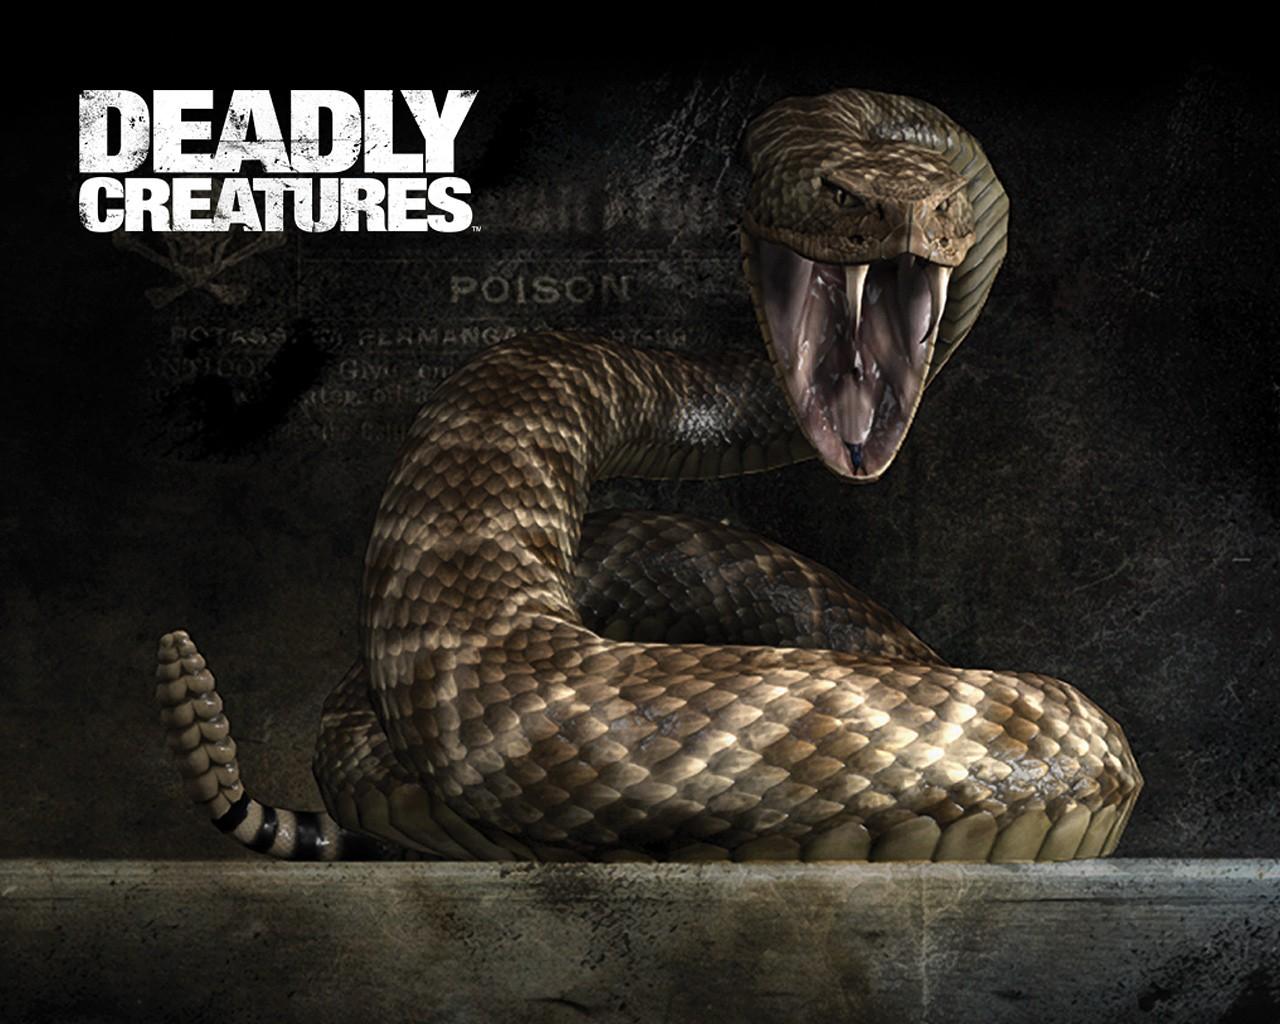 Hd Wallpaper Of Black Snake: Top 26 Snake Wallpapers In HD